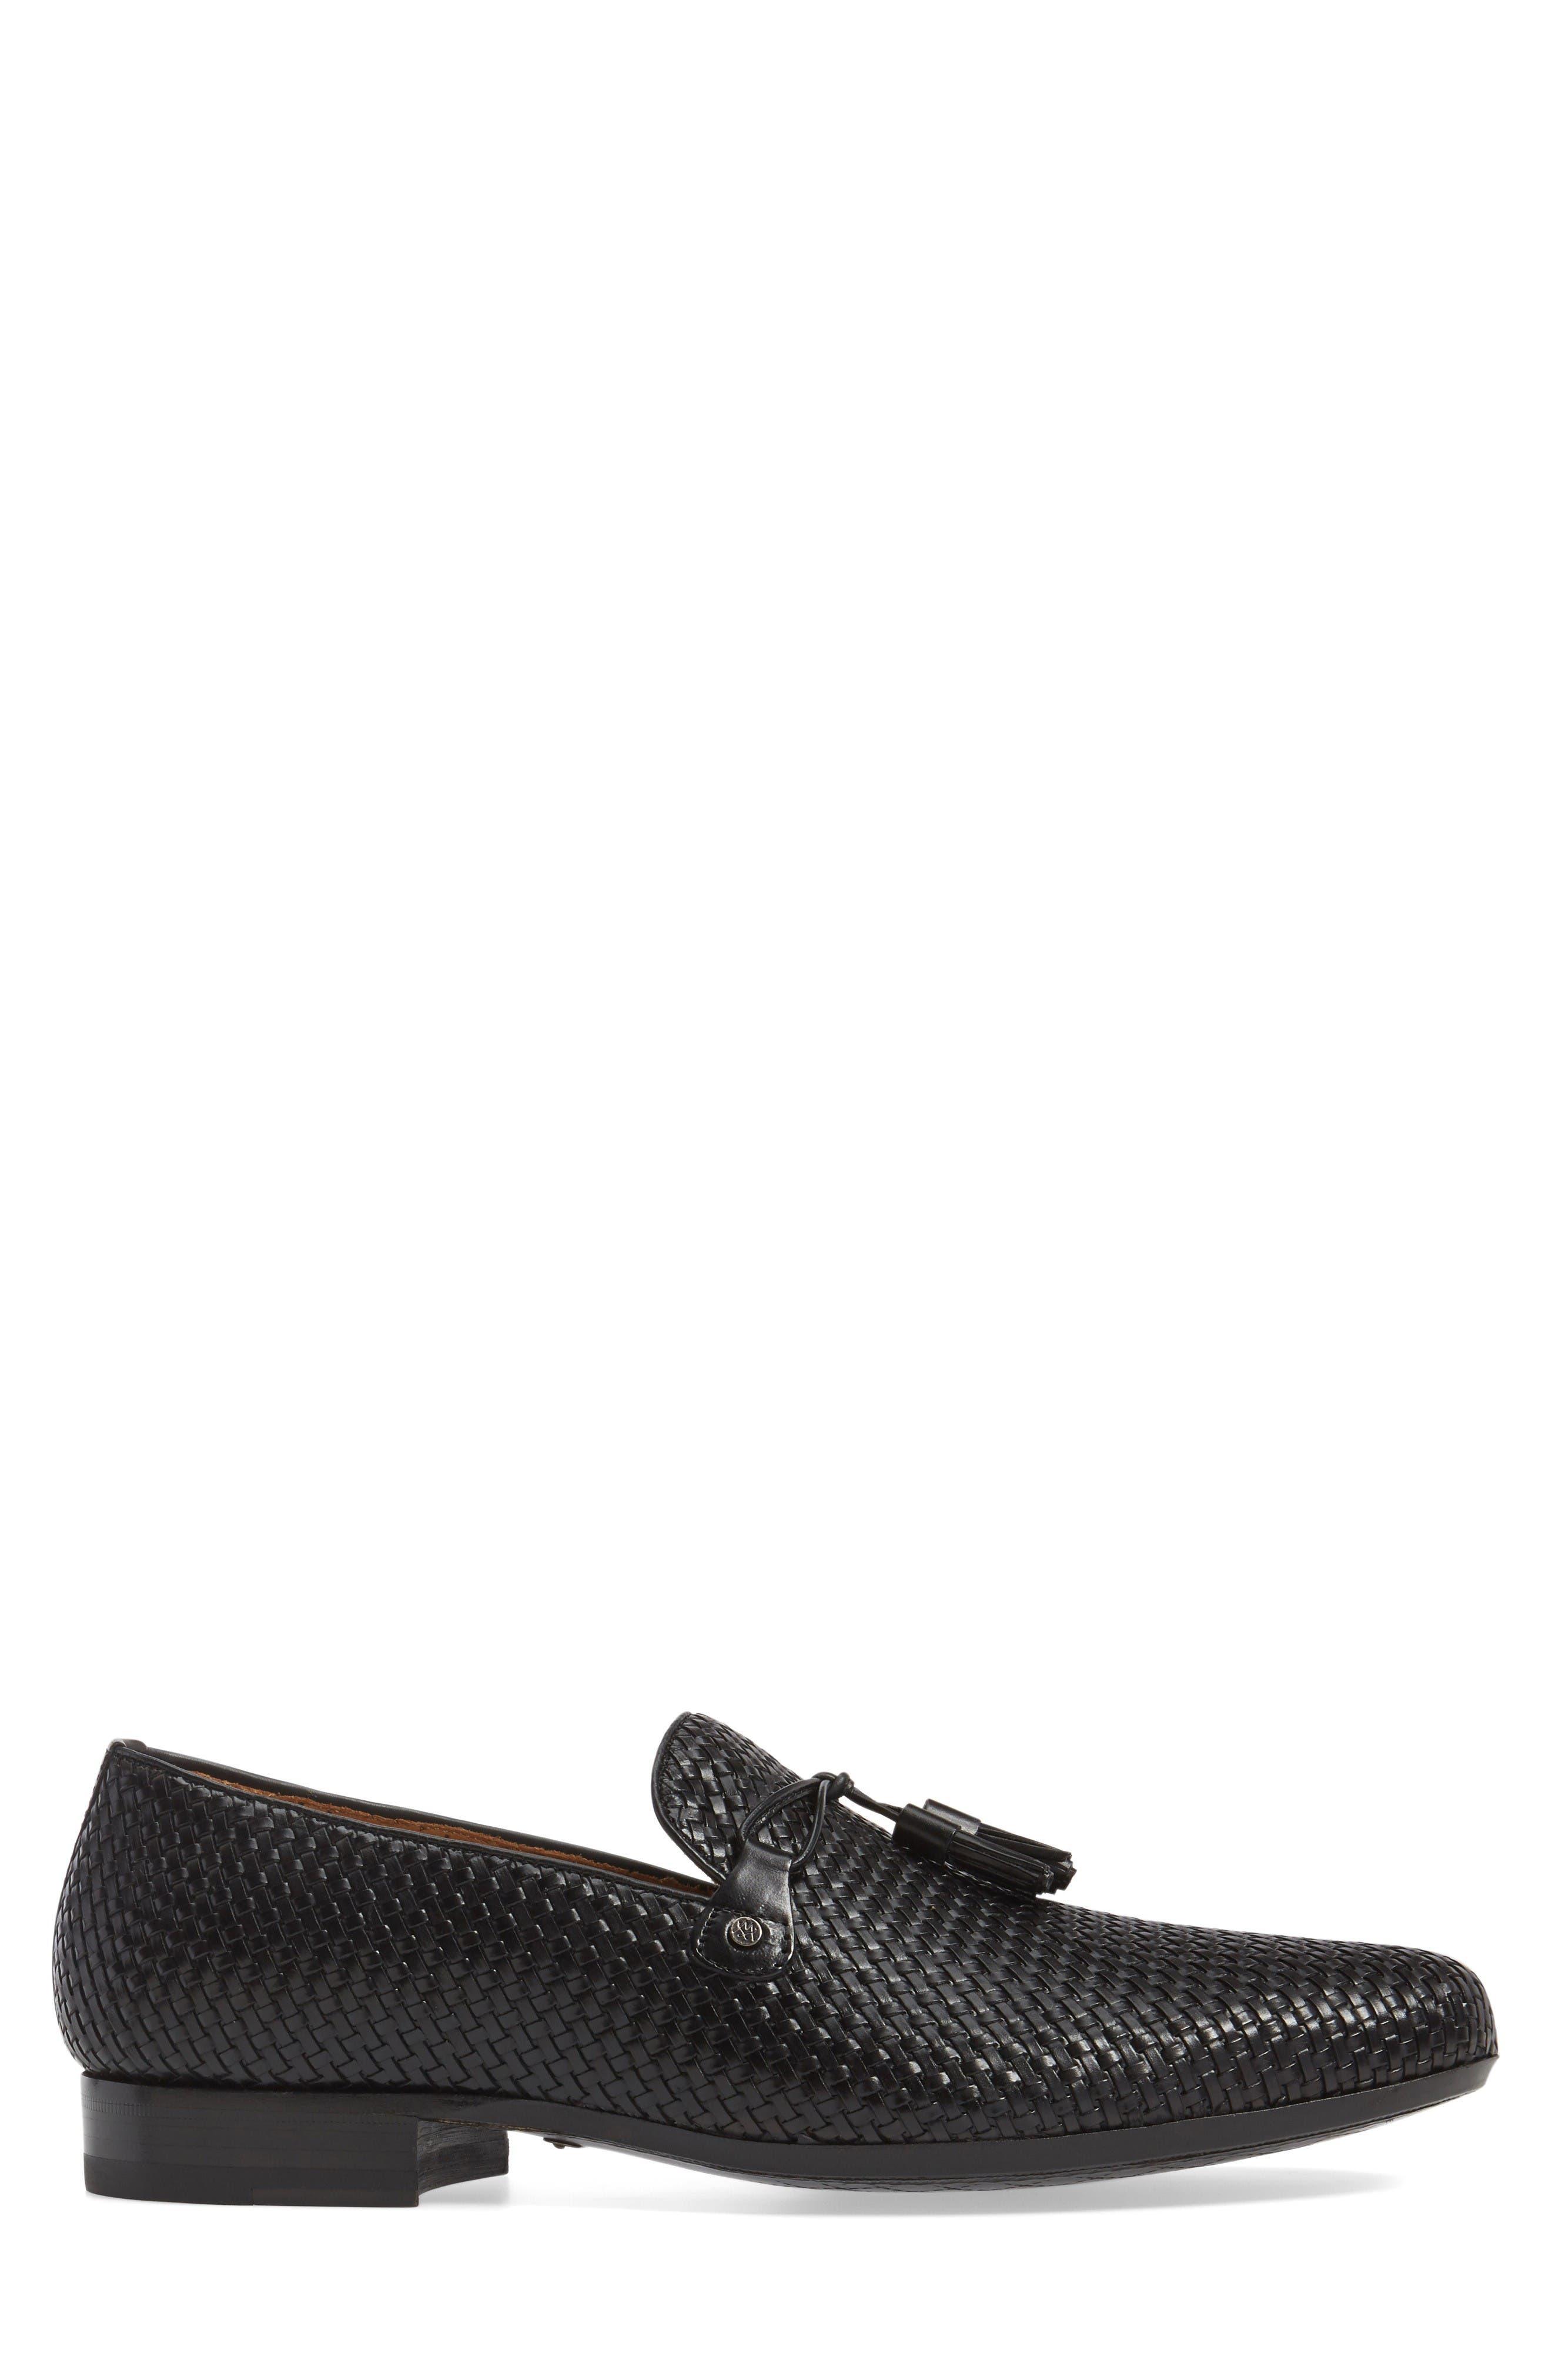 Turning Woven Tassel Loafer,                             Alternate thumbnail 3, color,                             Black Leather